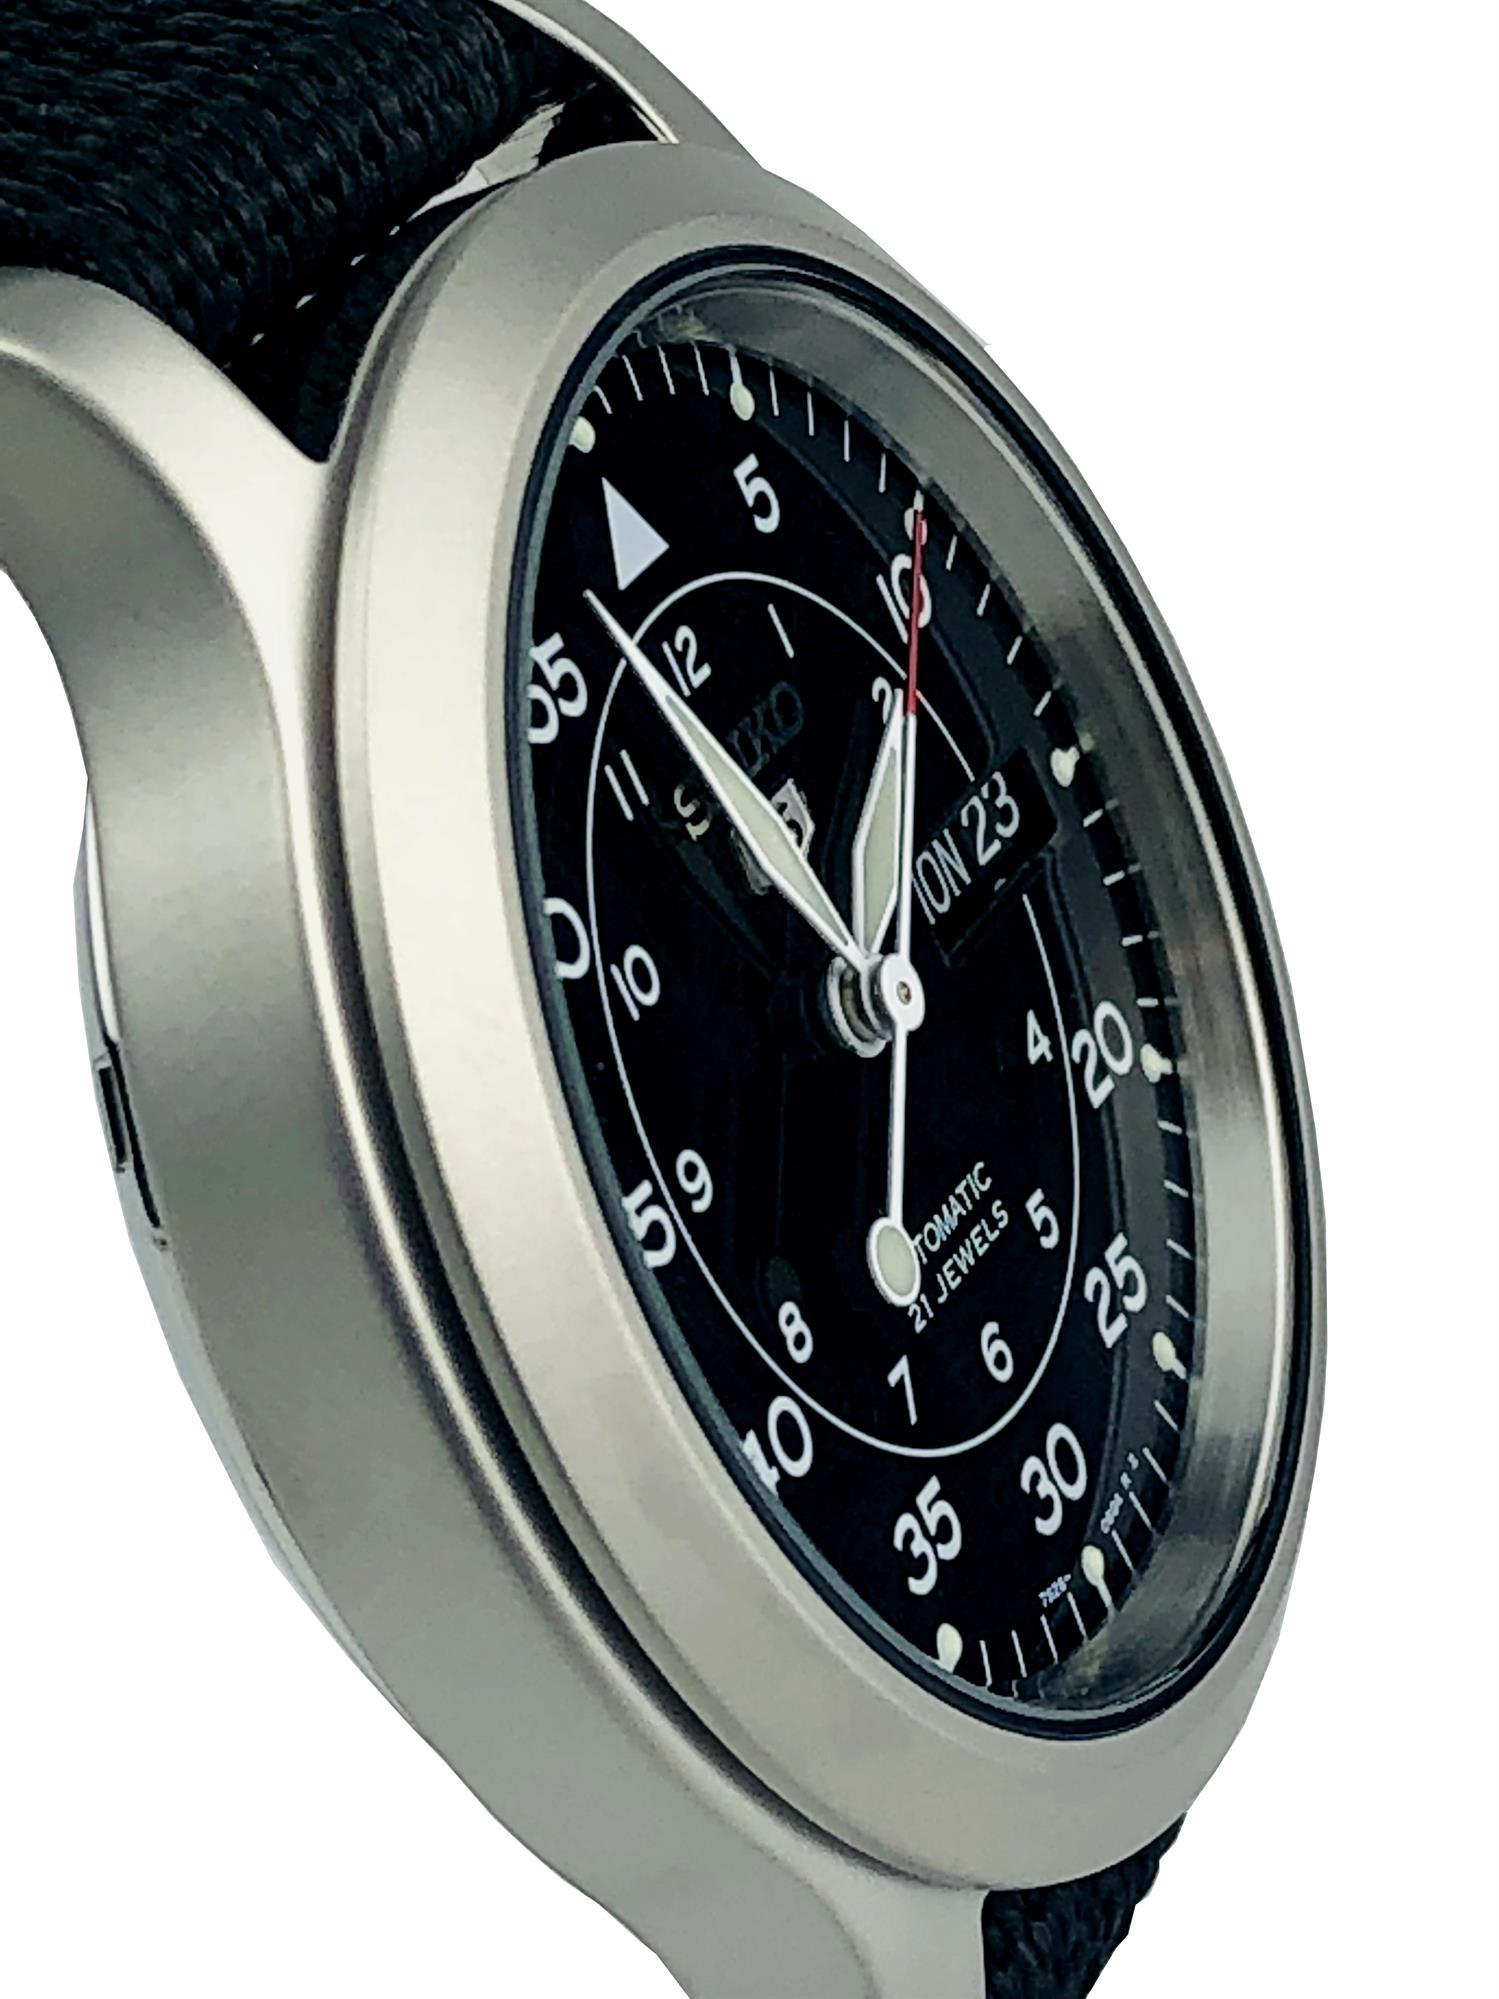 Seiko 5 SNK809K2 Military Black Automatic Men's Watch